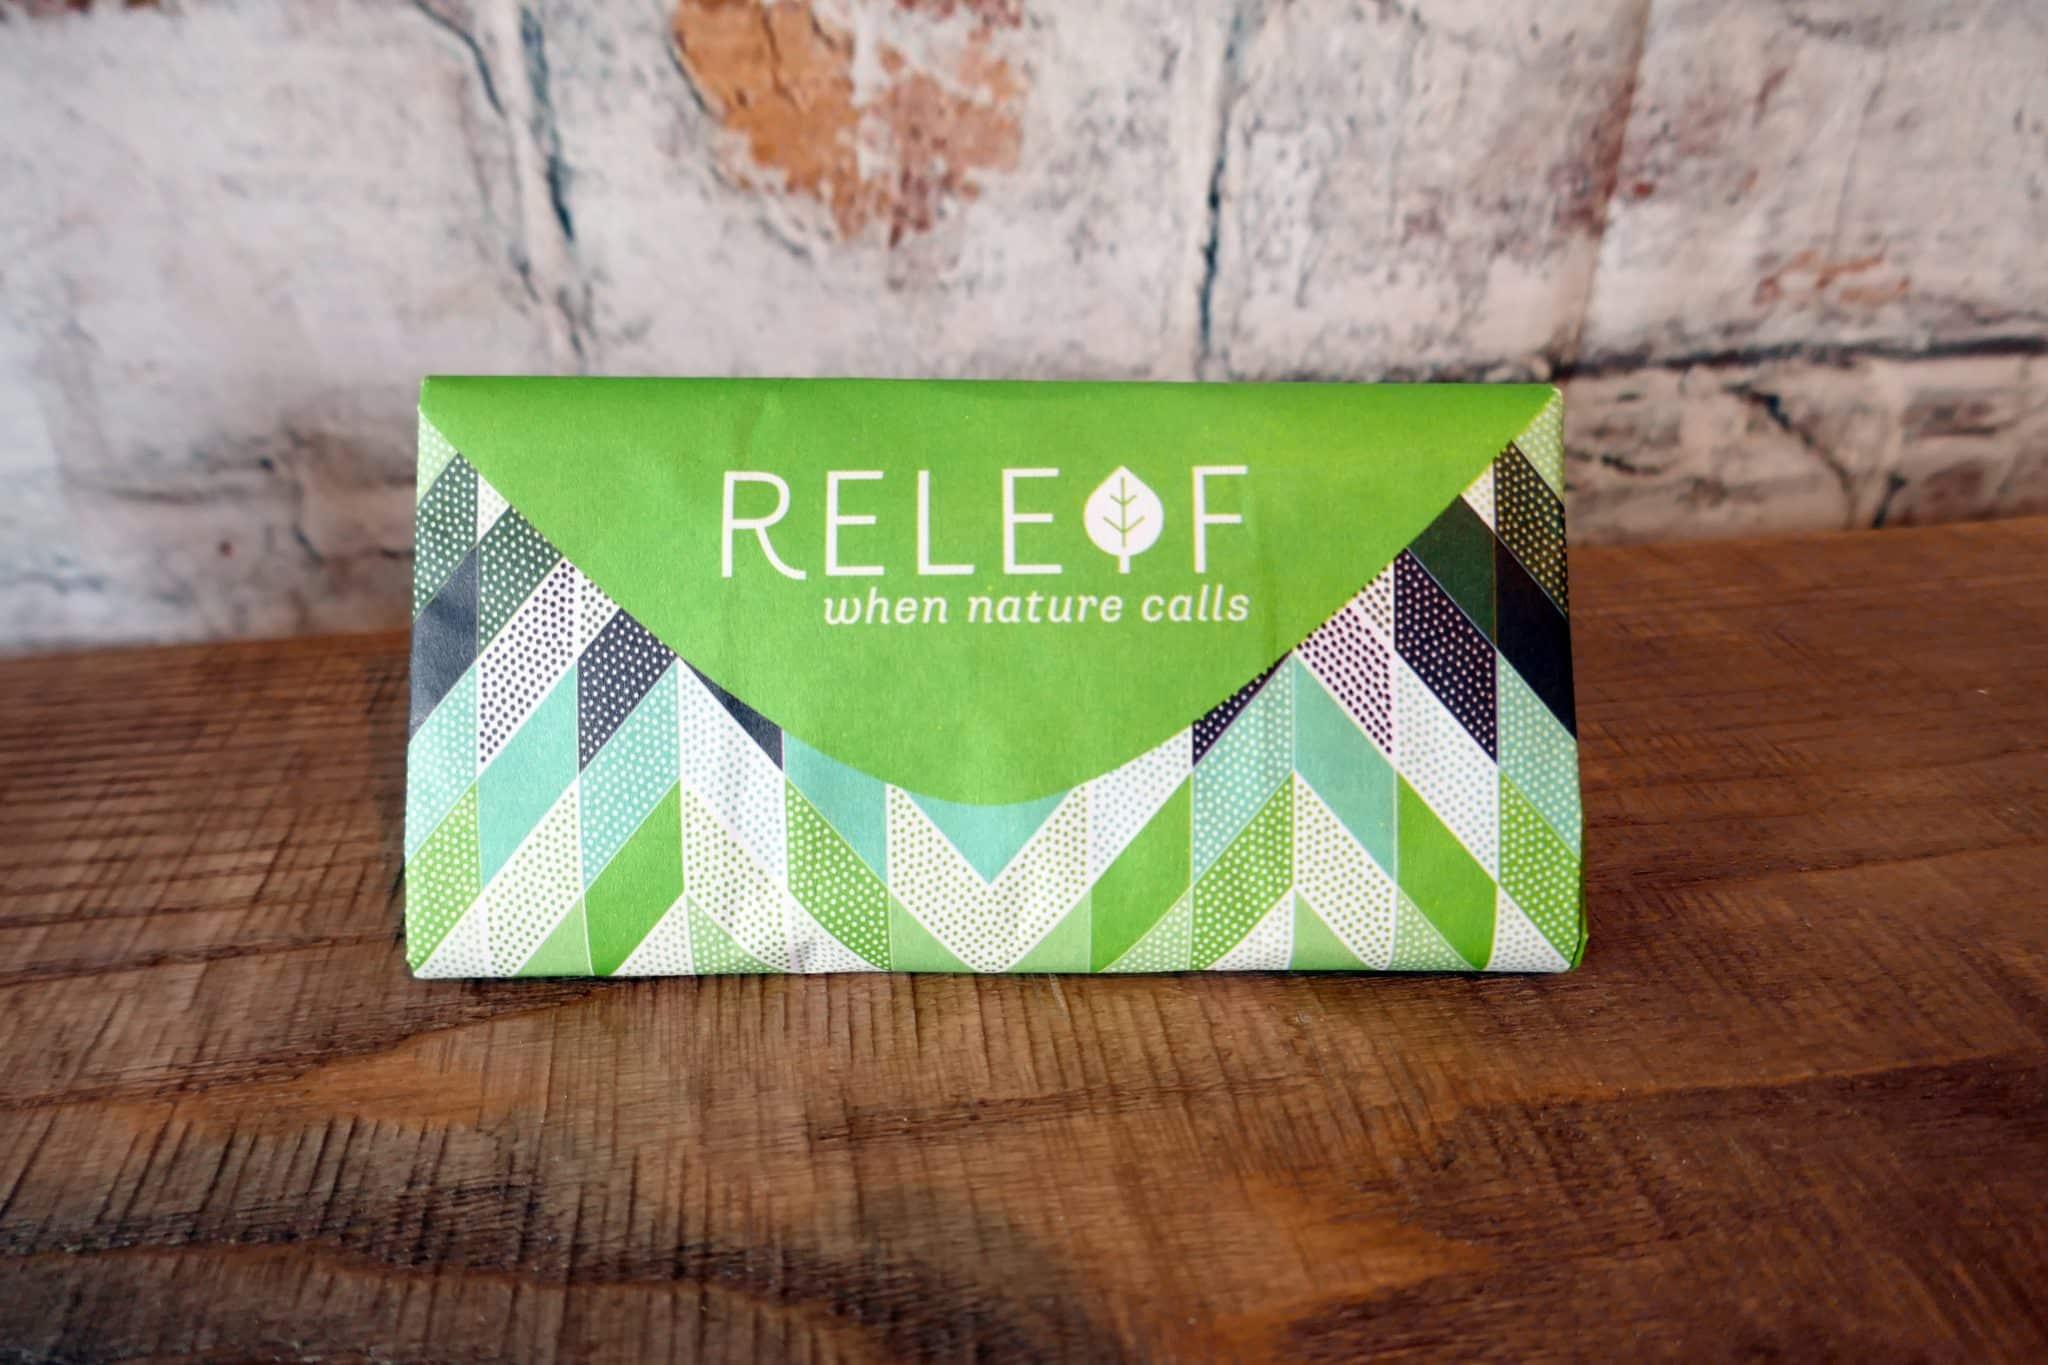 biodegradable-packaging-releaf-bag-relief-relieve-pee-urinate-environmental-design-logo